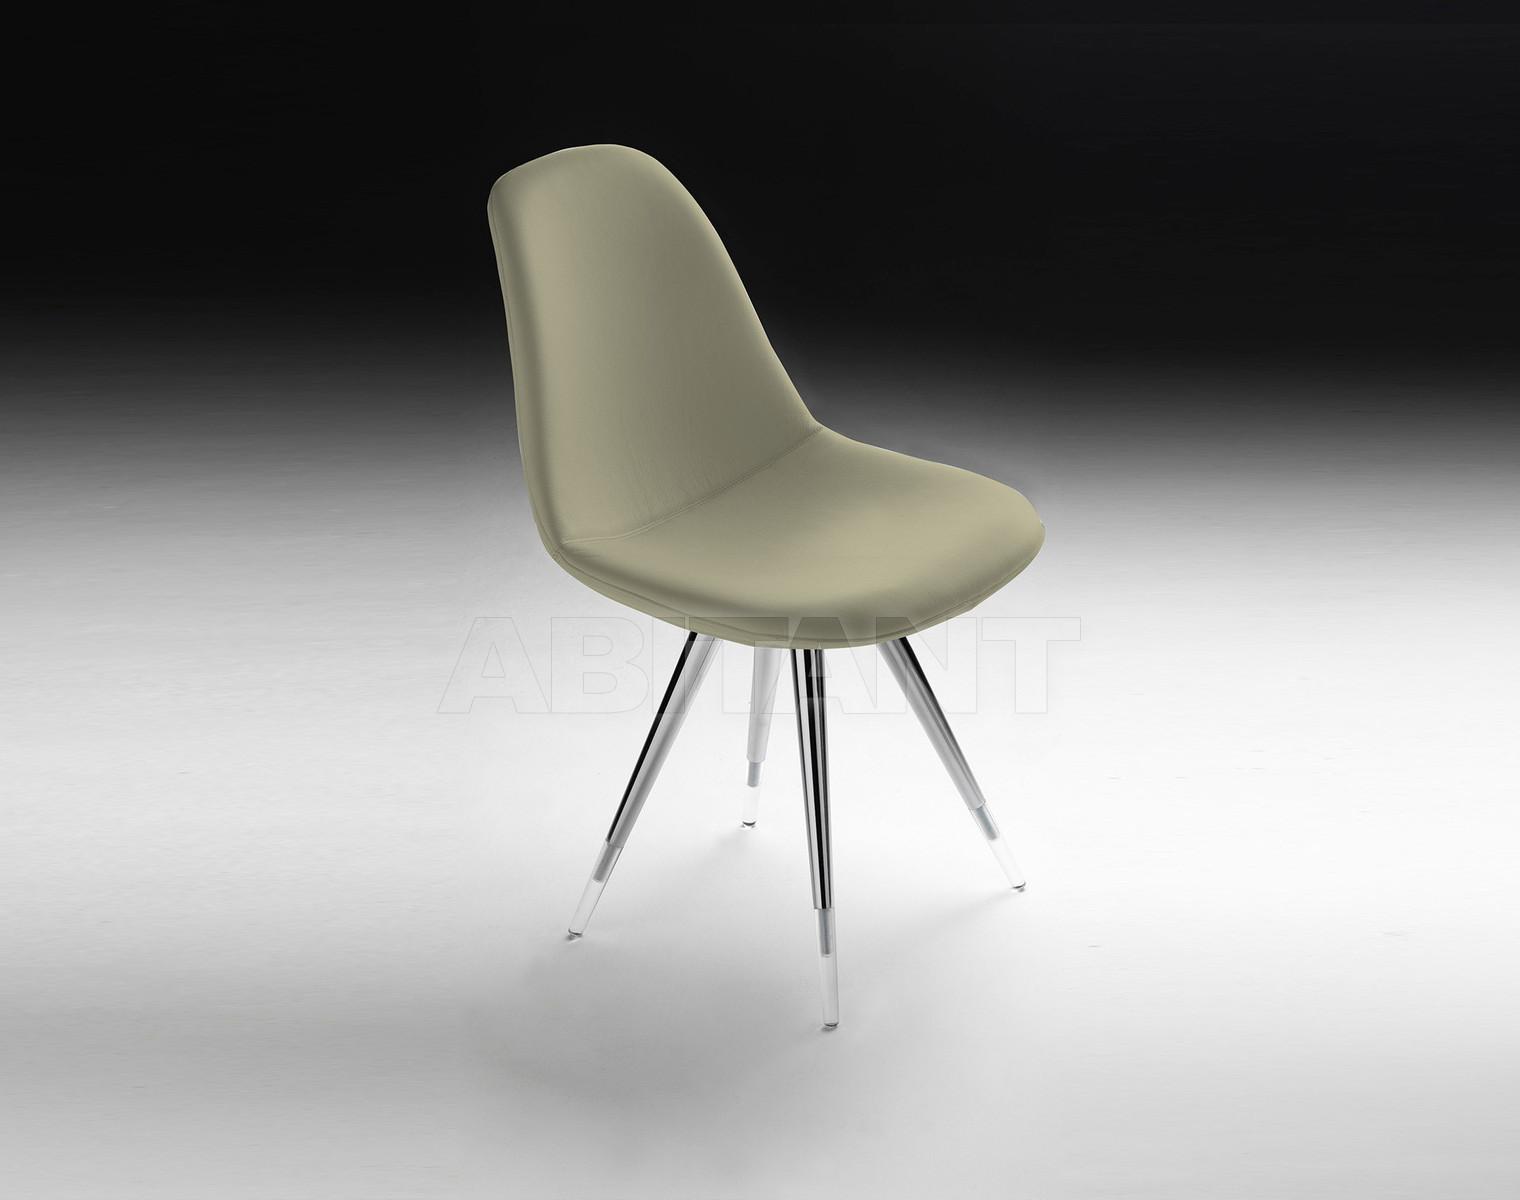 Купить Стул Kubikoff Gino Lemson & Ruud Bos Angel'POP'Chair' 02